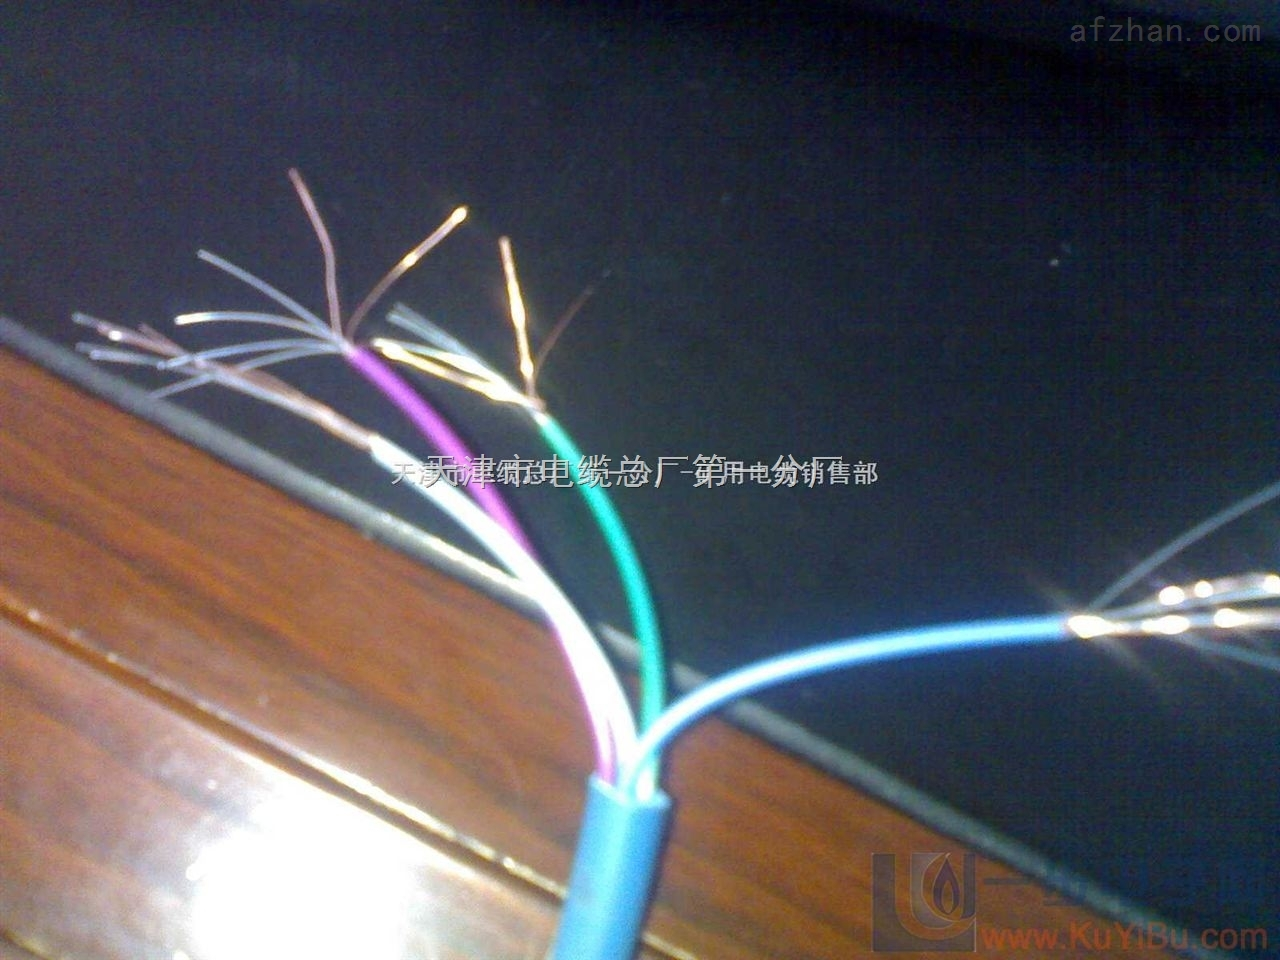 MHYV,MHYAV,MHYA矿用通信电缆多少钱